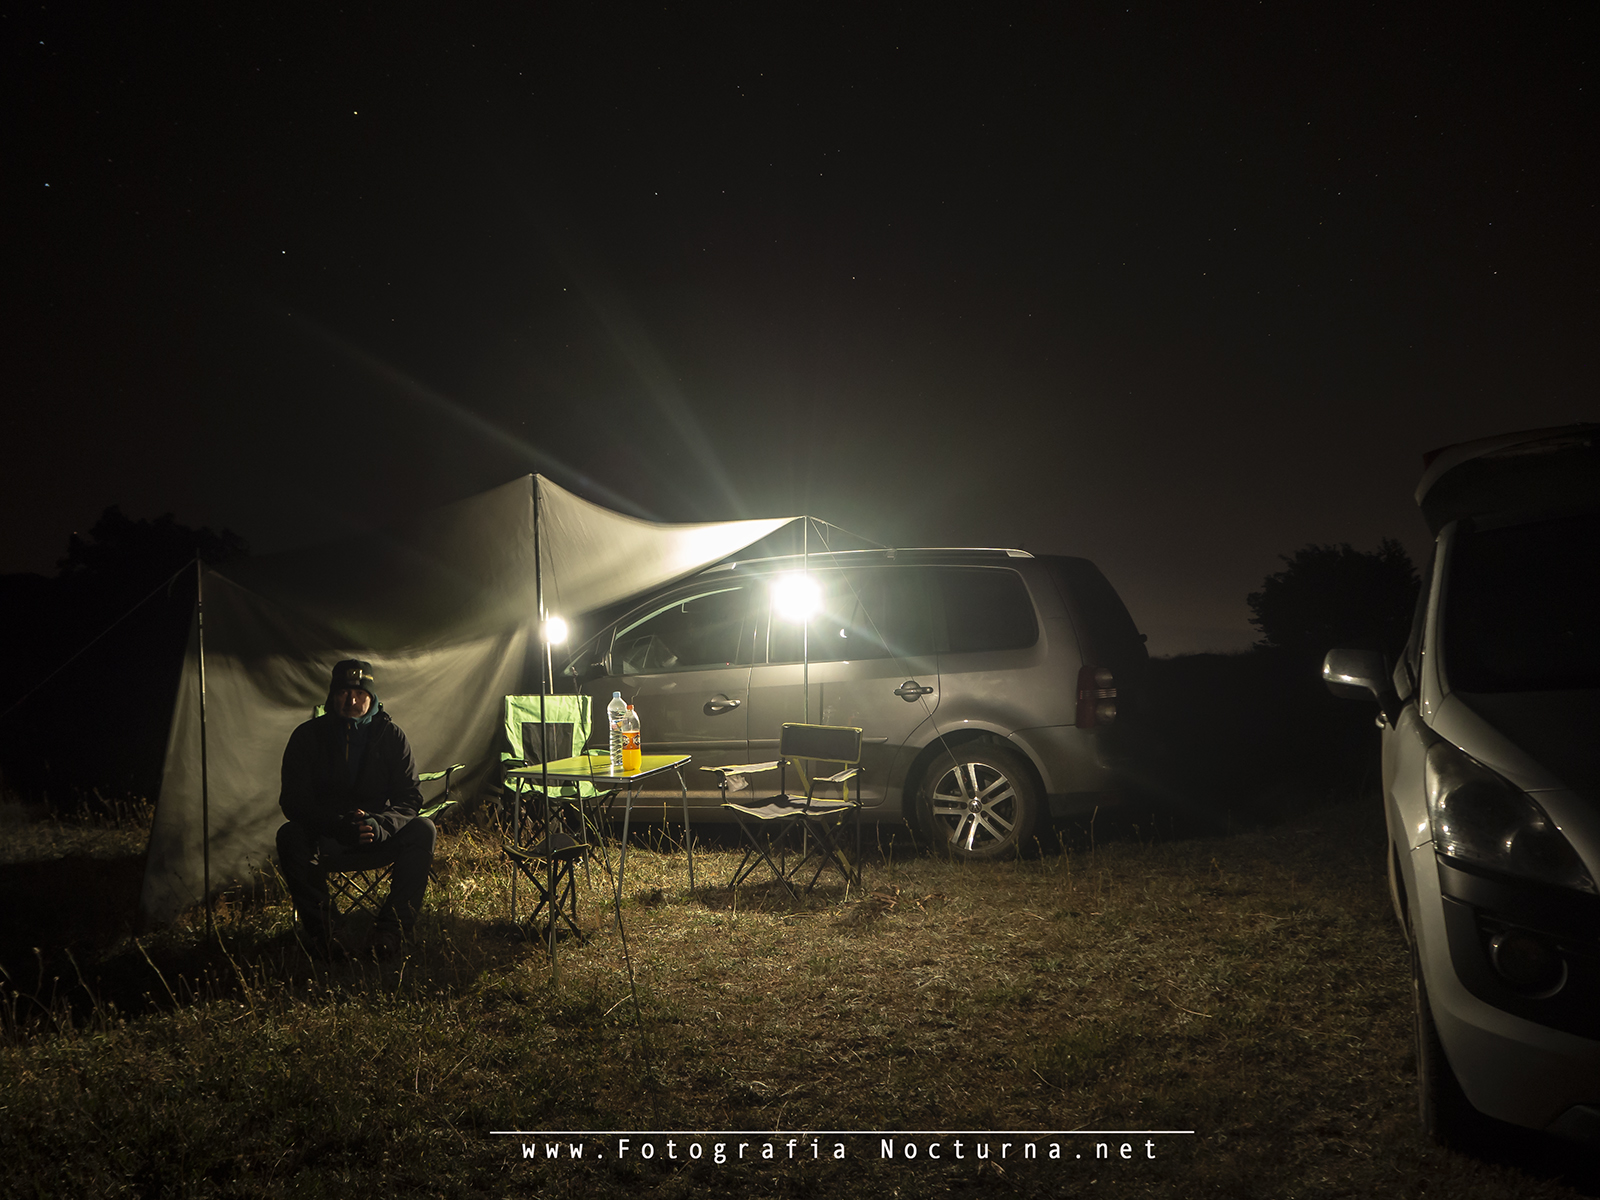 Camp rain of stars Perseids 2018